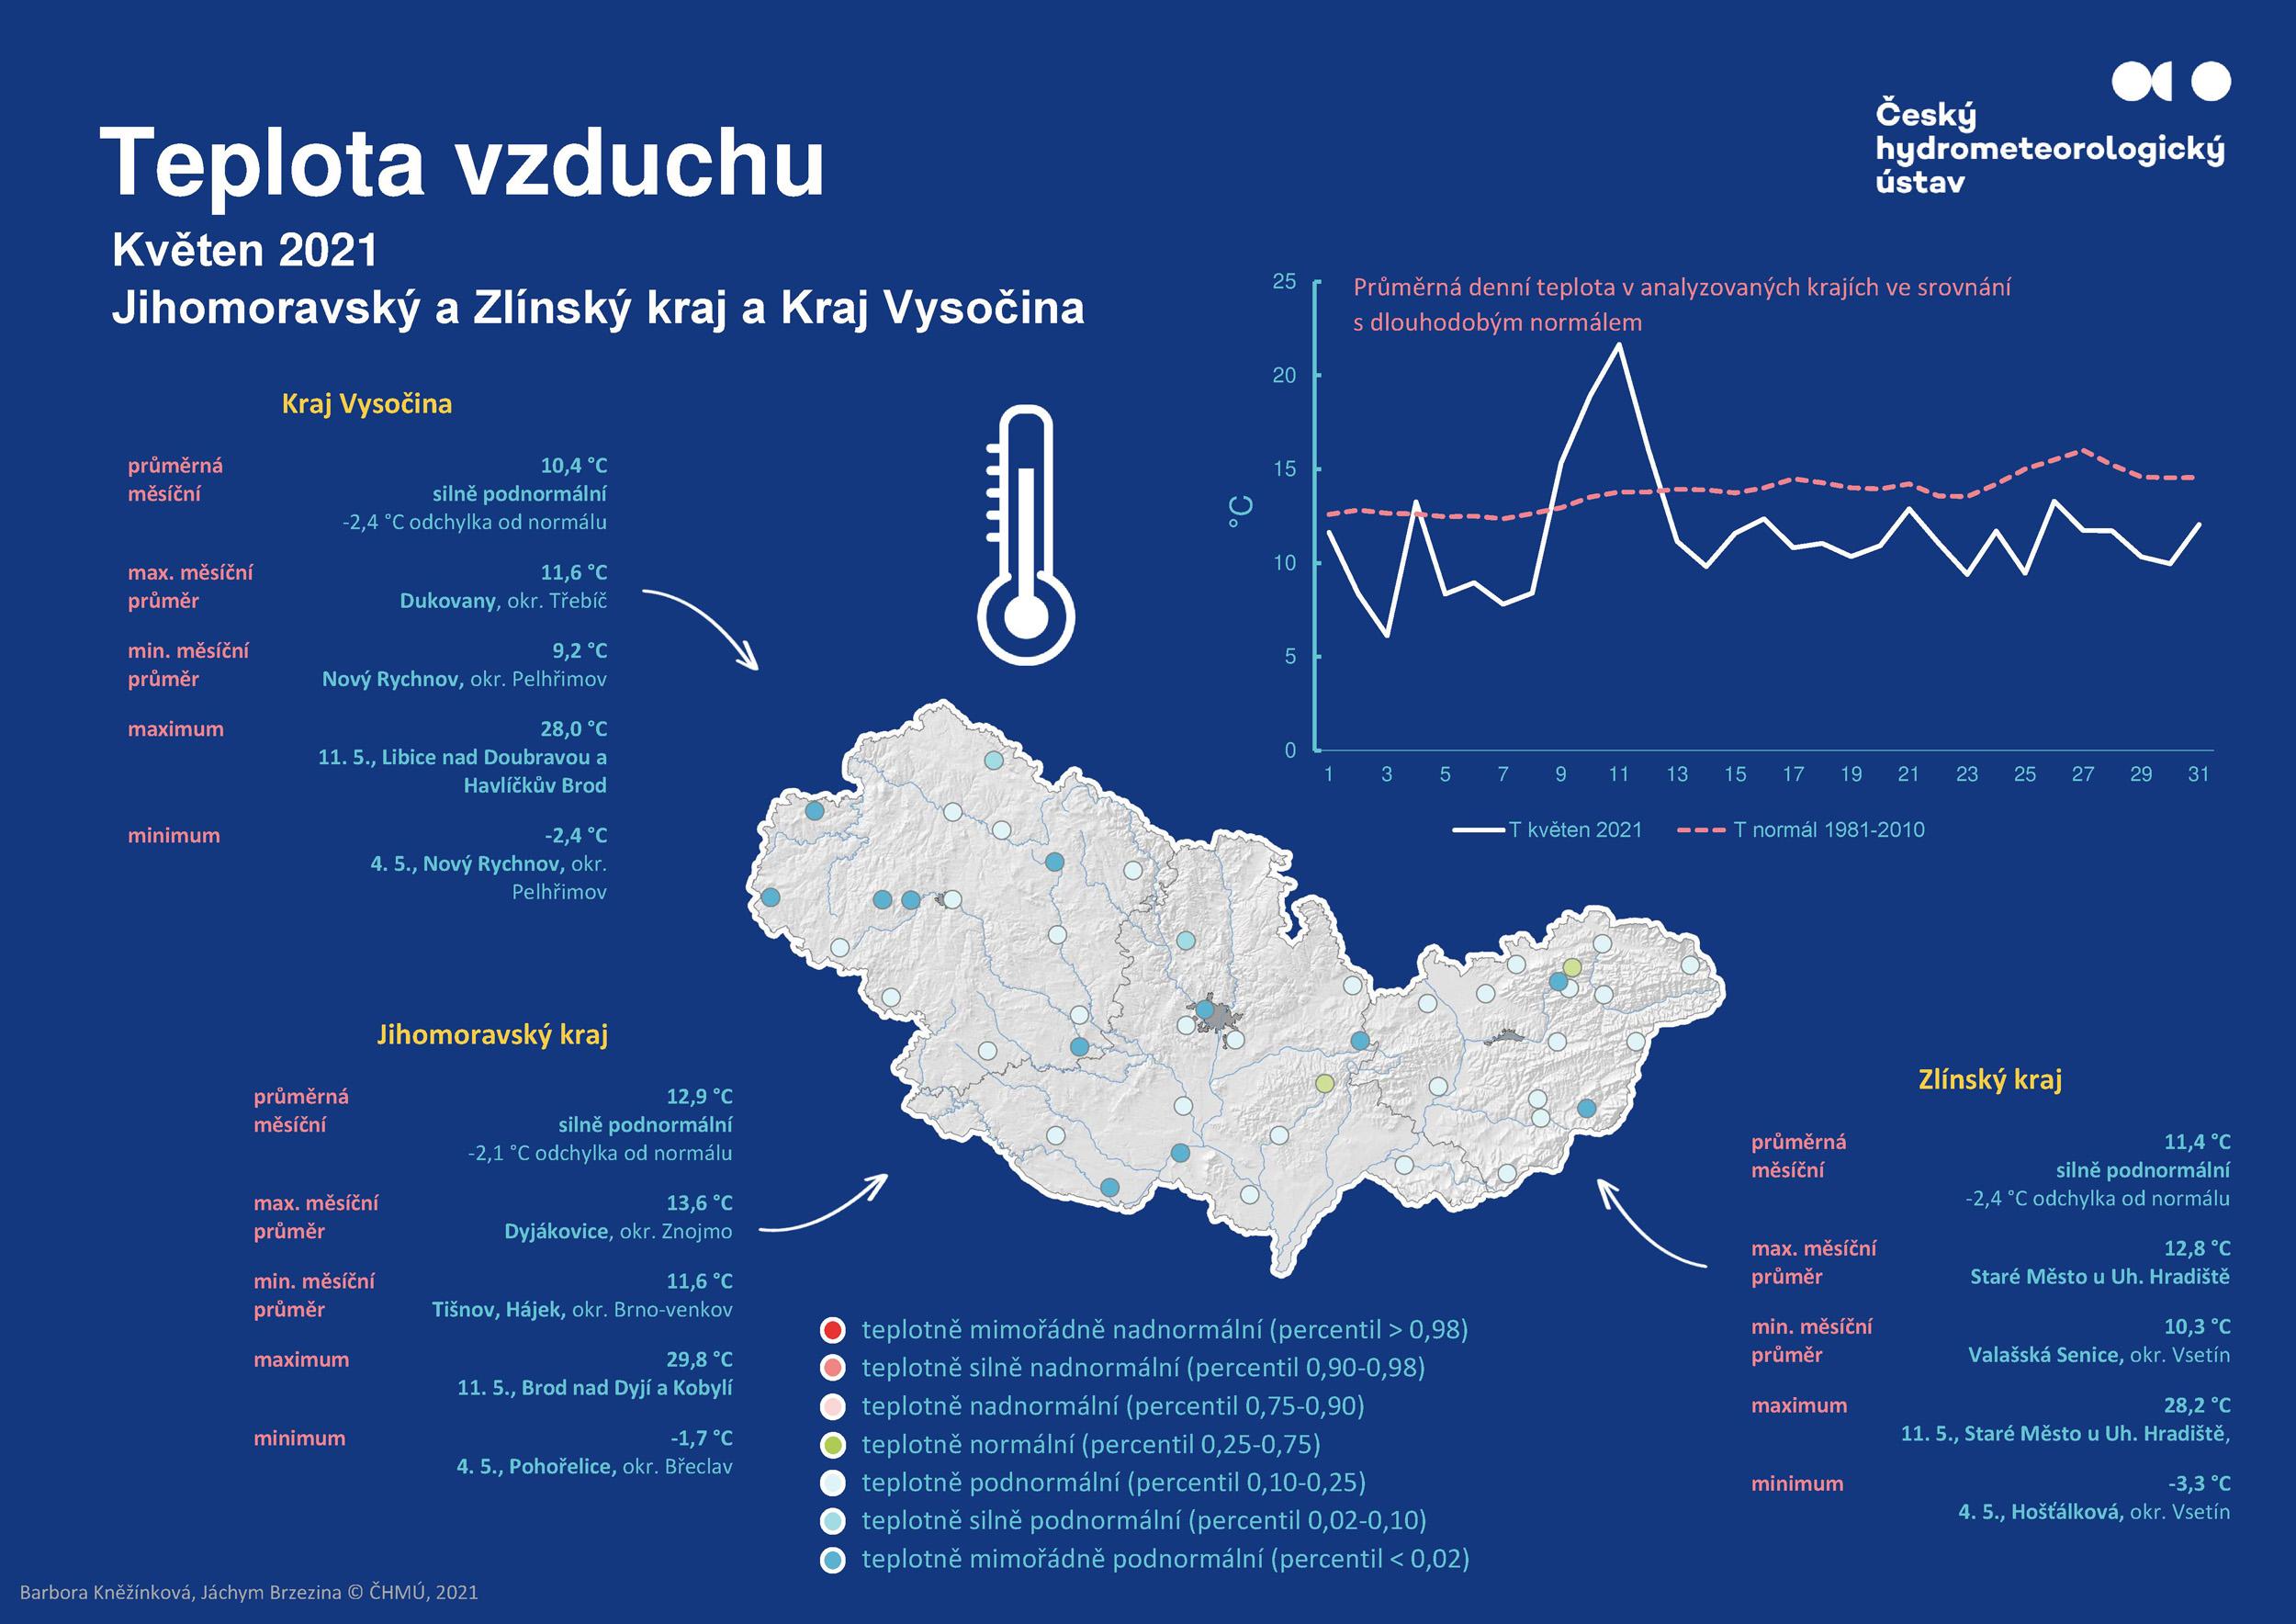 Teplota vzduchu v dubnu 2021 – Jihomoravský kraj, Zlínský kraj a Kraj Vysočina1 min čtení